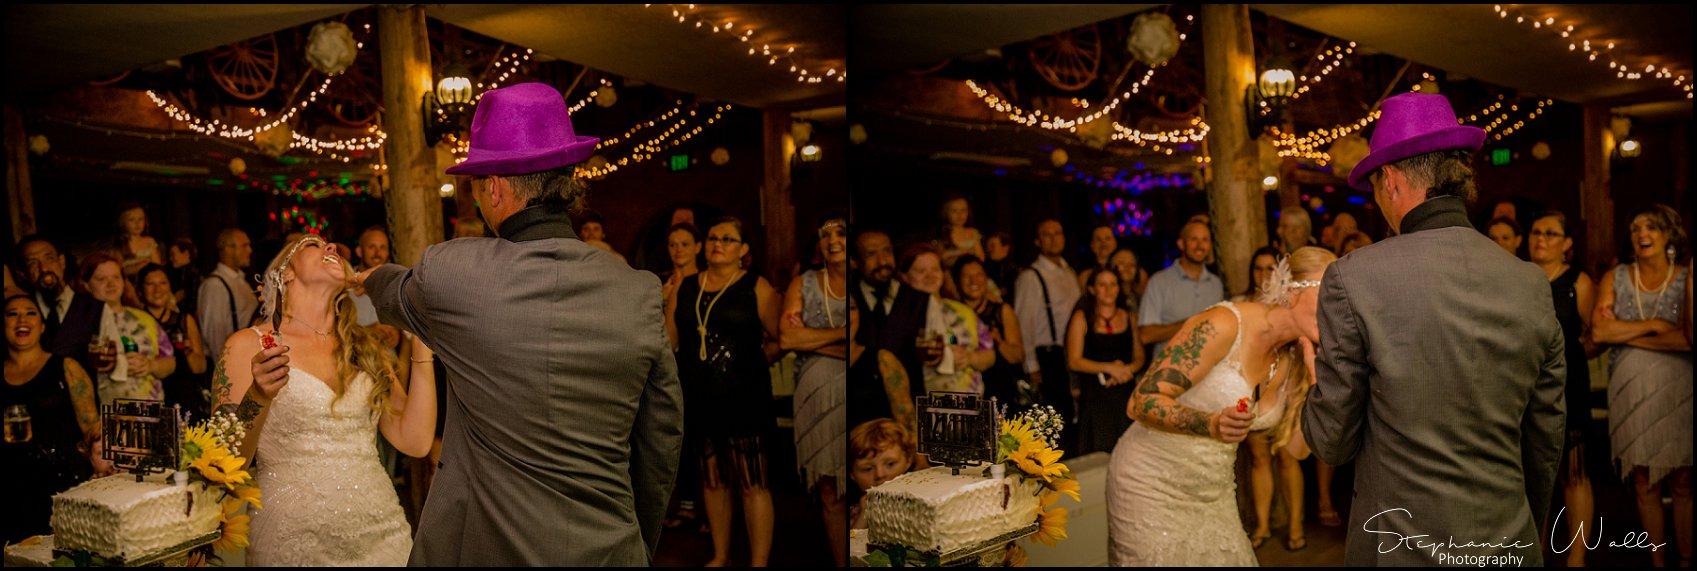 Everist Wedding 015 Patti & Bobbys | Troll Haven Castle & Bandy Farms | Sequim, Wa Wedding Photographer